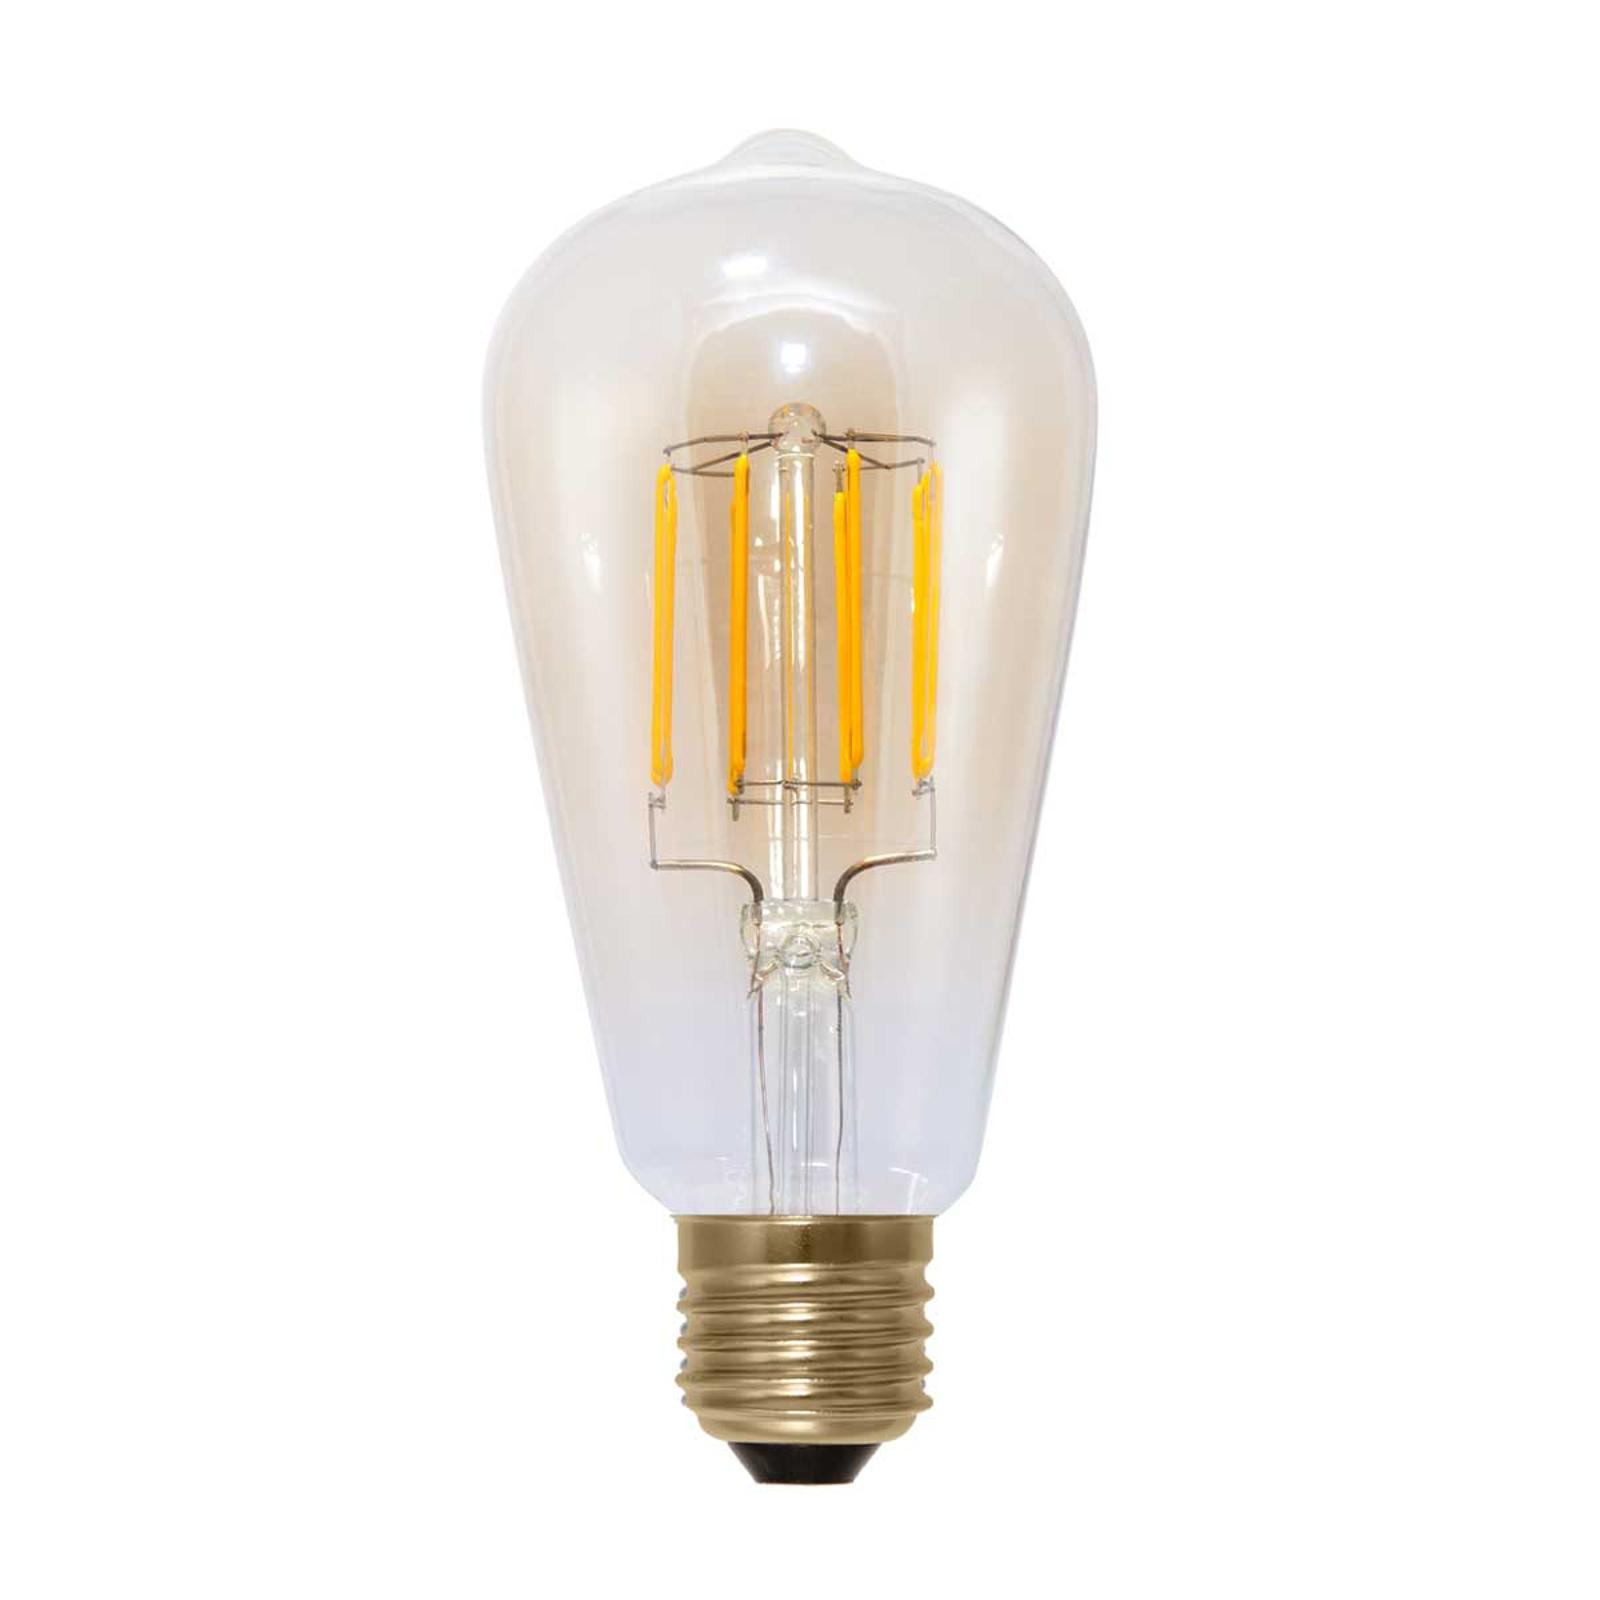 E27 6 W 920 LED-rustikkpære med glødetråder